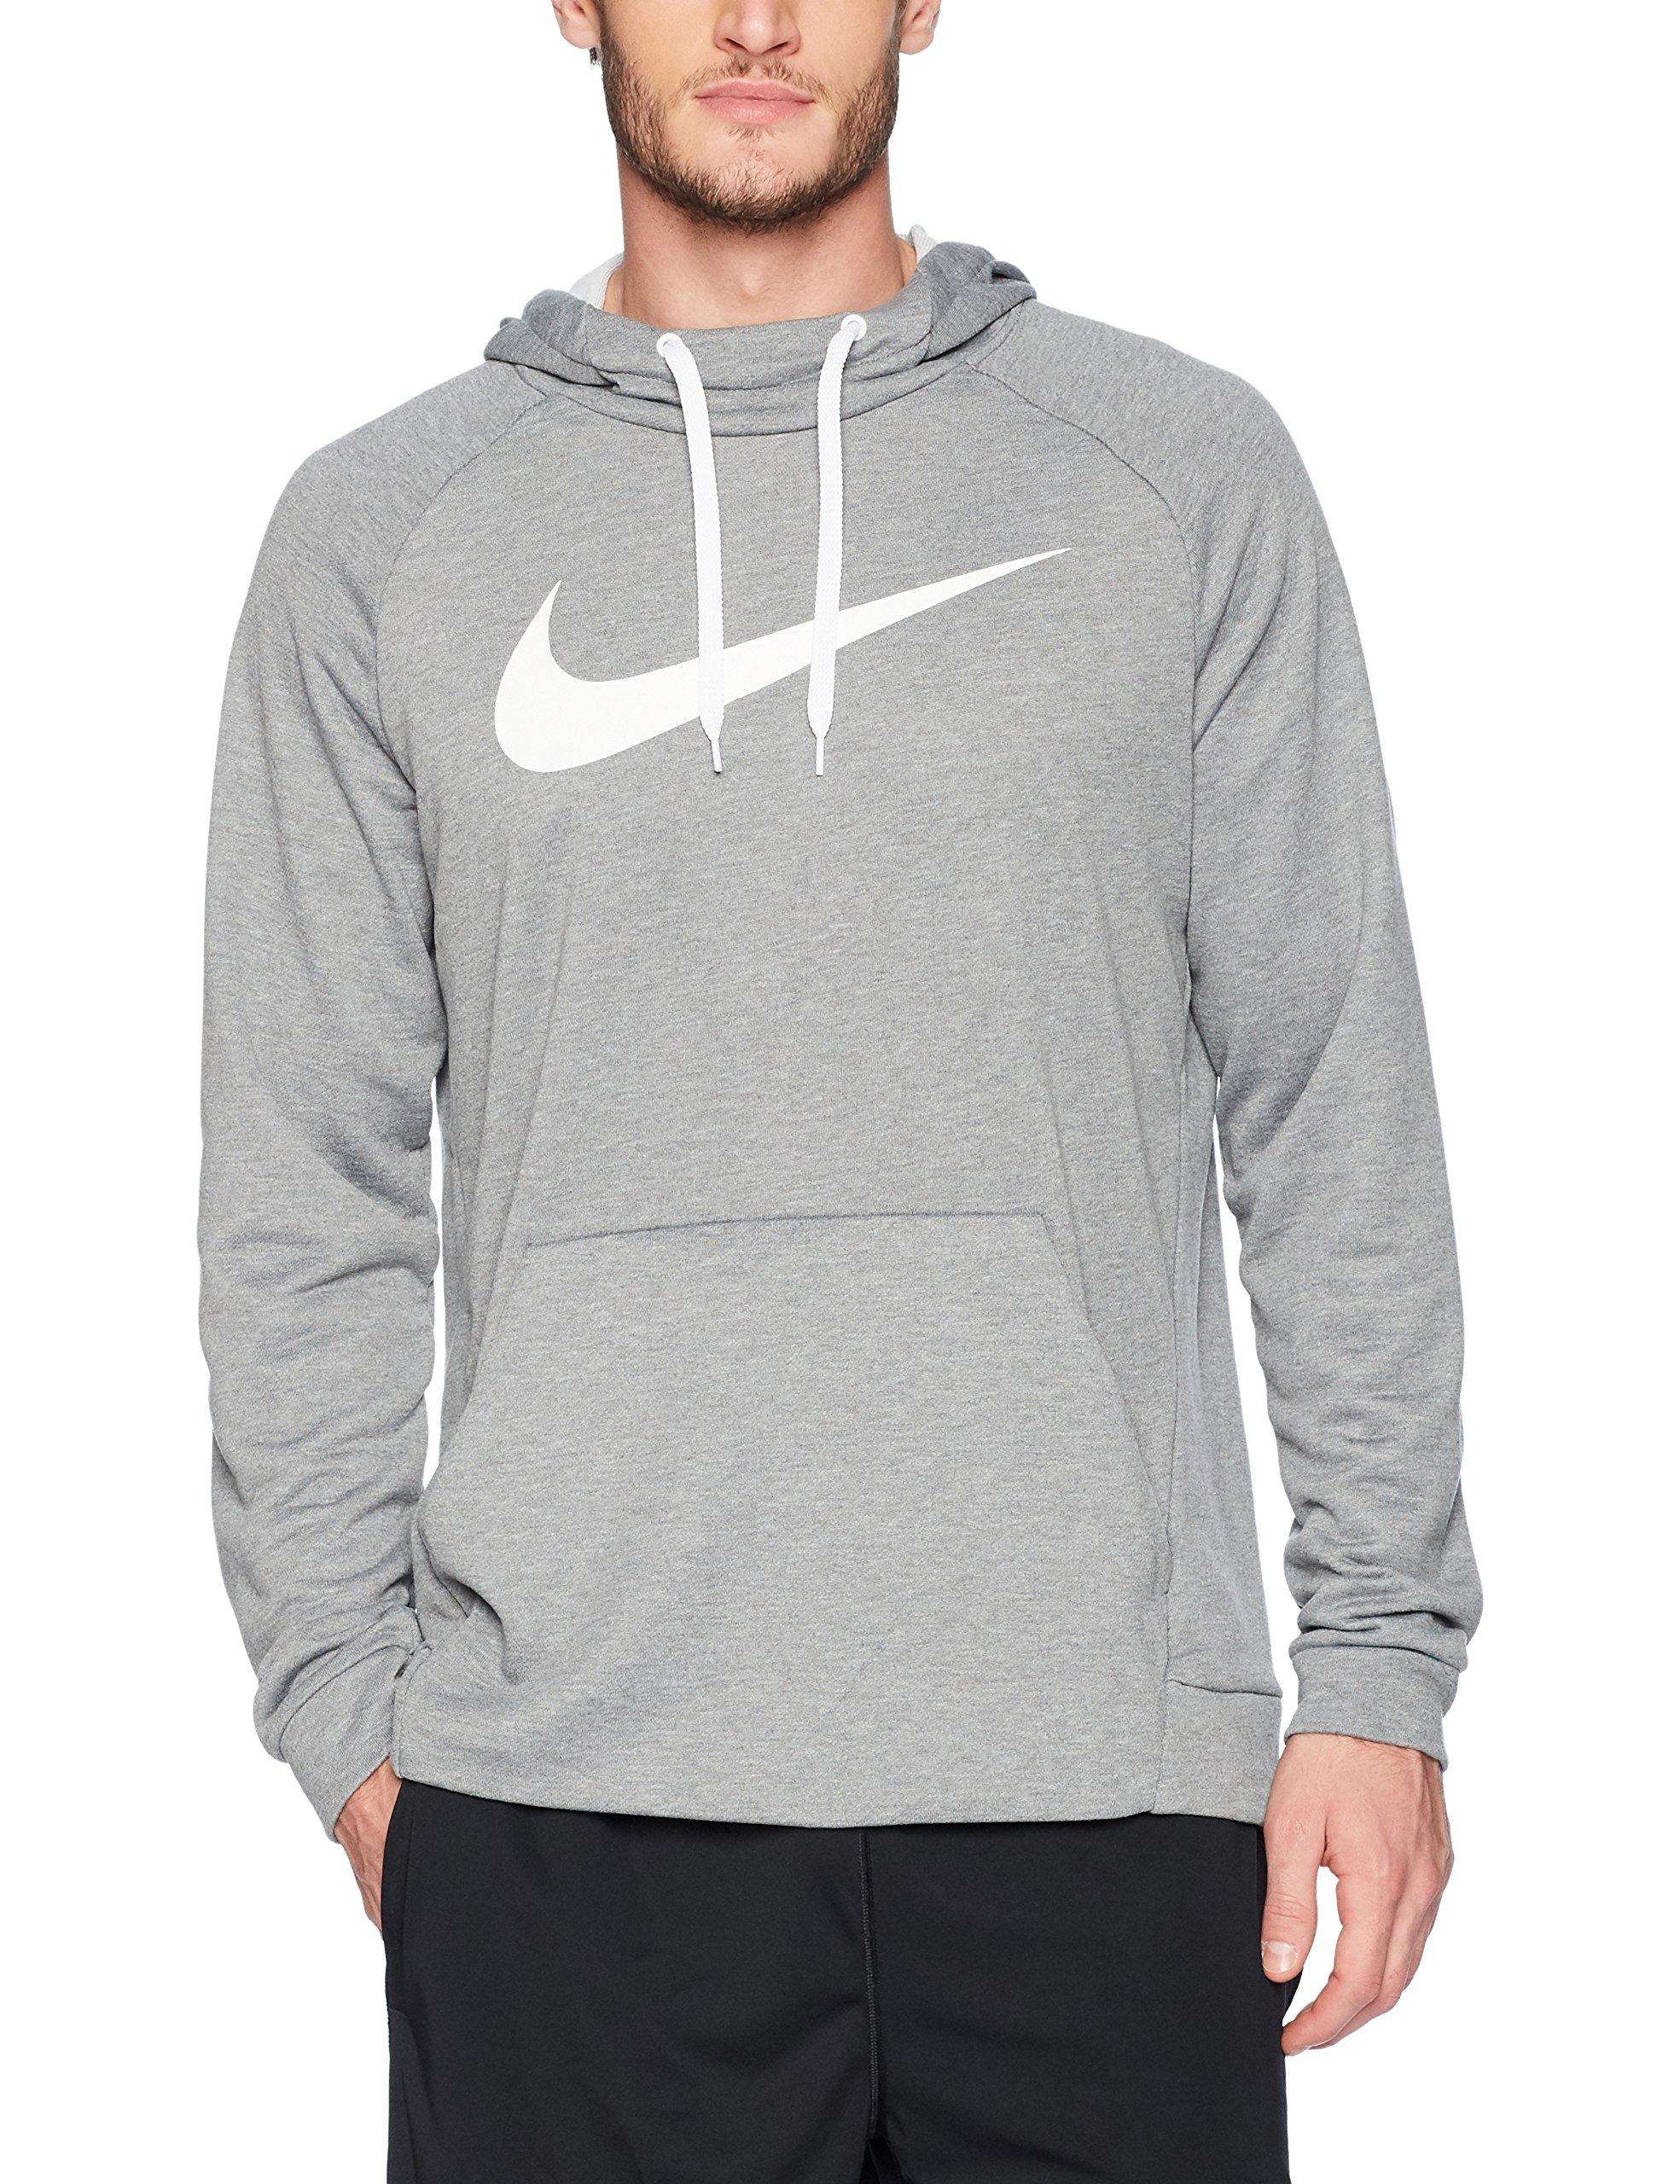 NIKE Men's Dry Pullover Swoosh Hoodie, Carbon Heather/White, Medium